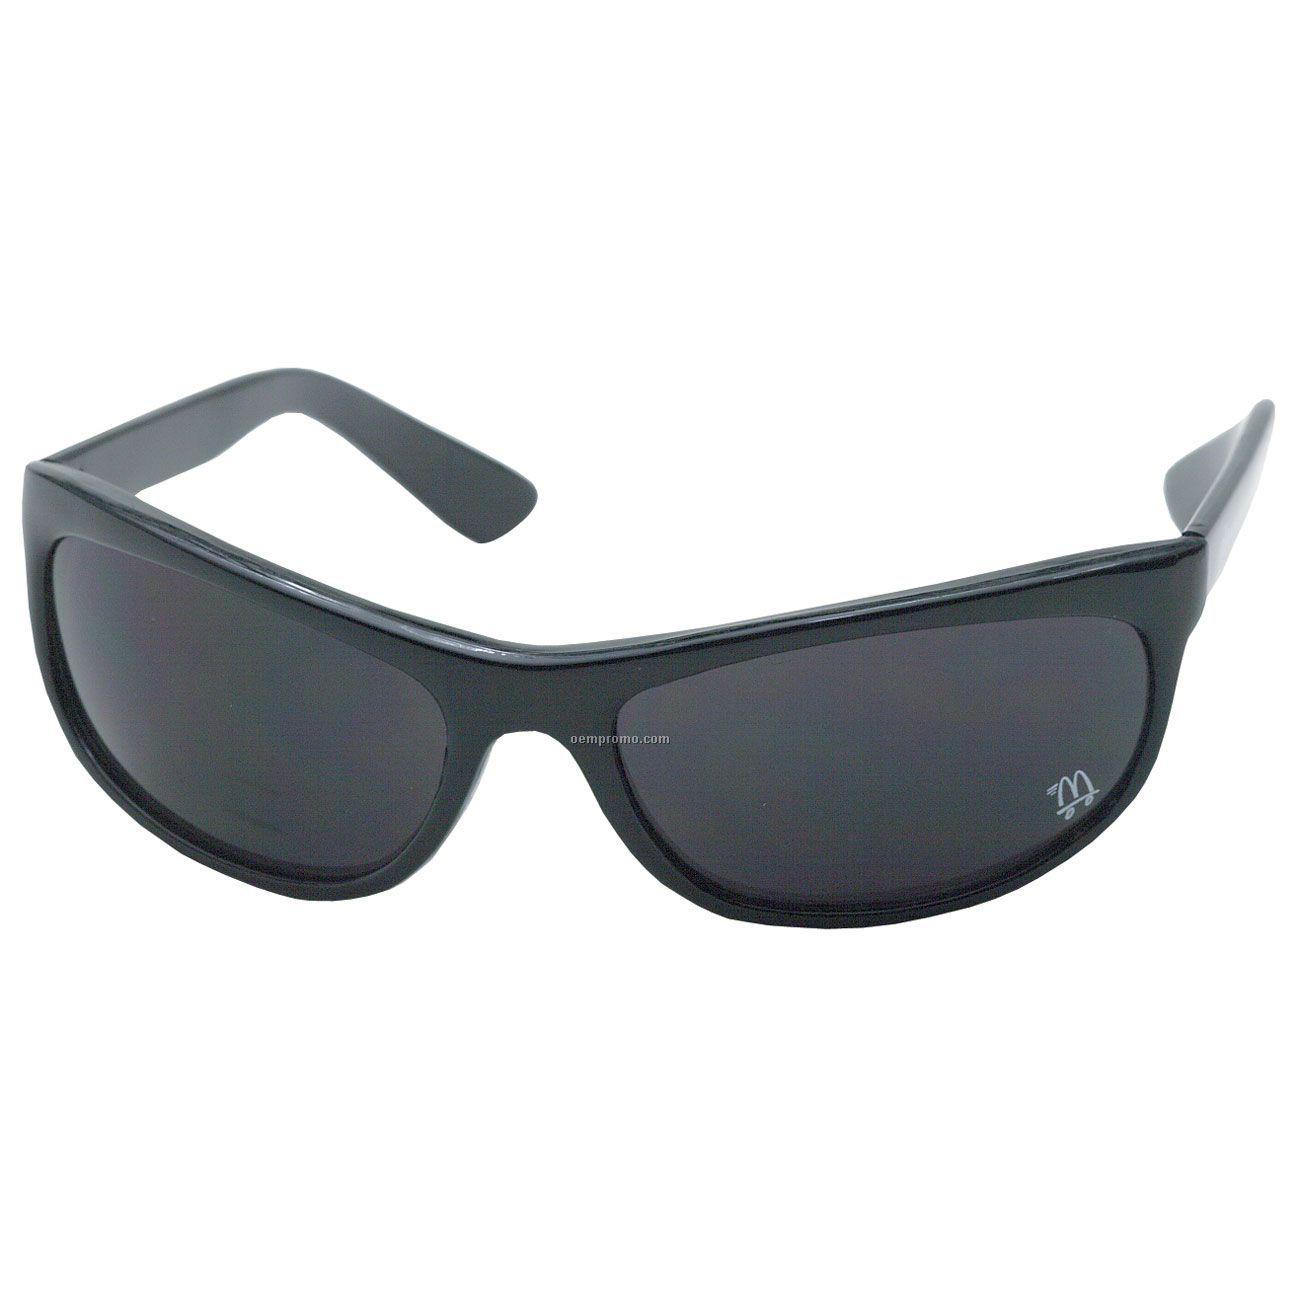 Wrap Traditional Shiny Black Sunglasses W/ Smoke Lens